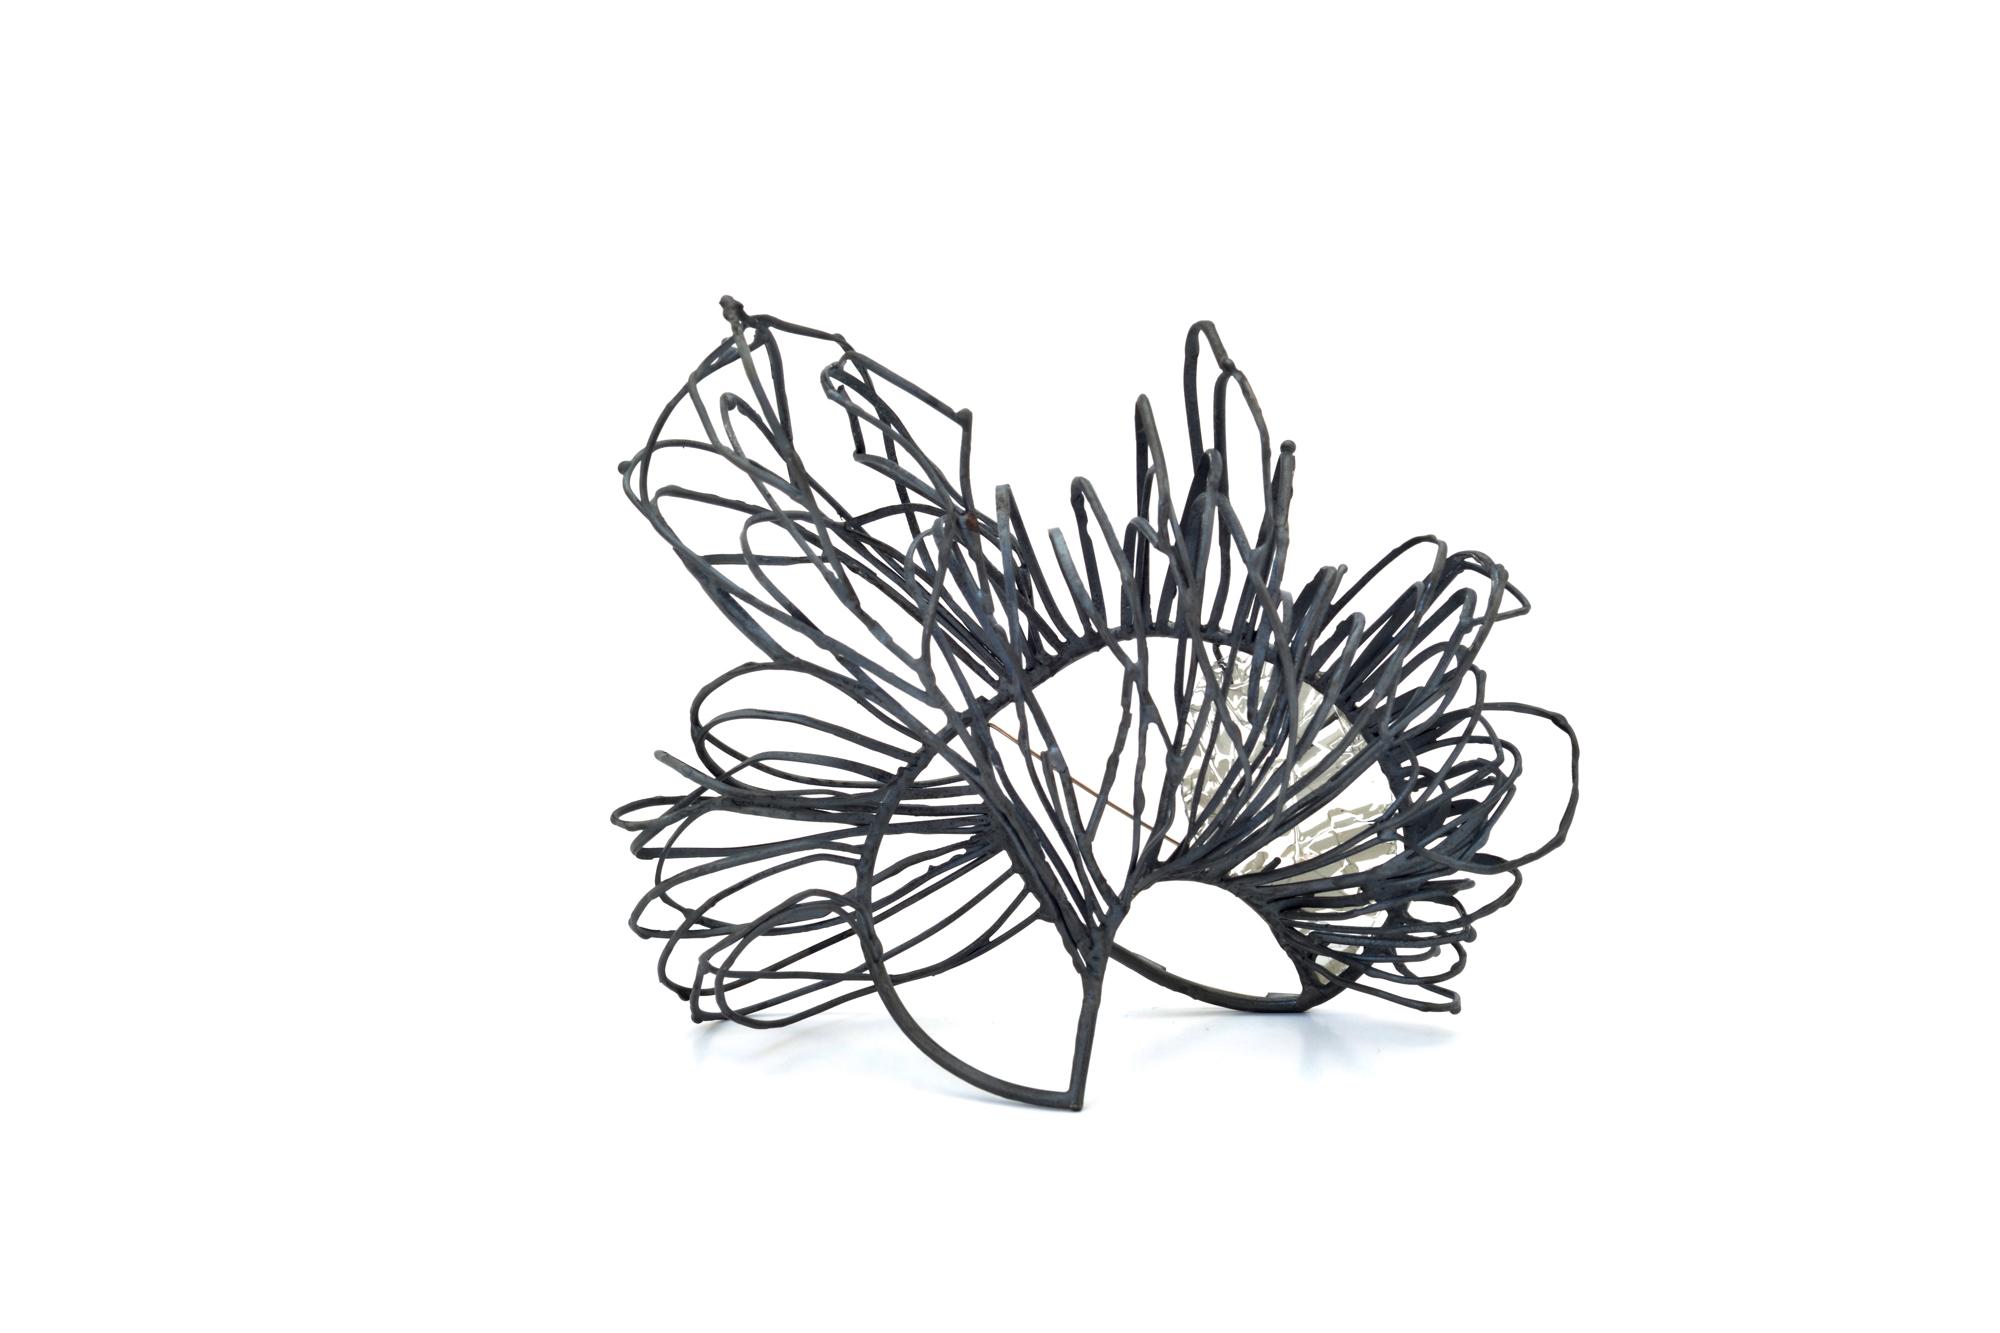 web-222-martacarmela-sotelo-mirrors 4-1-brooch-blackened-silver-phonescreen-marion-friedmann-gallery.jpg